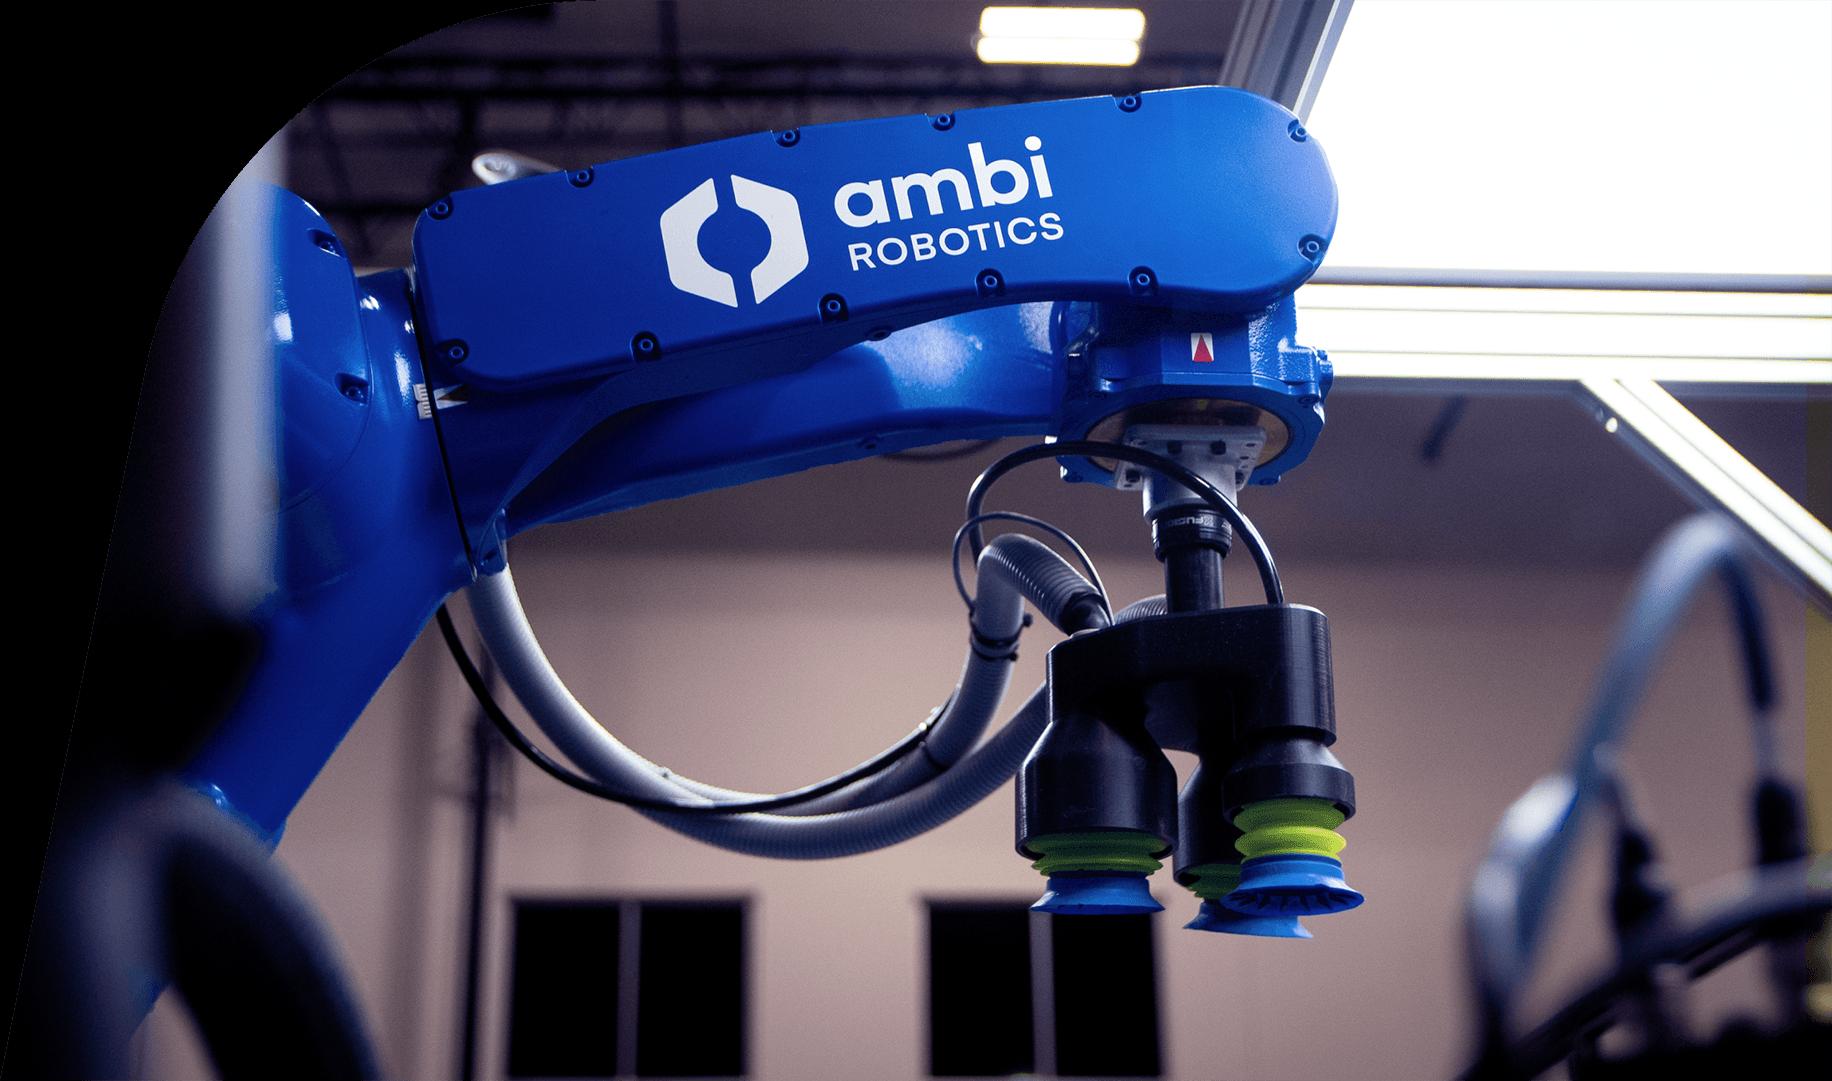 Ambi Robotics: New logo design on AmbiSort robot arm